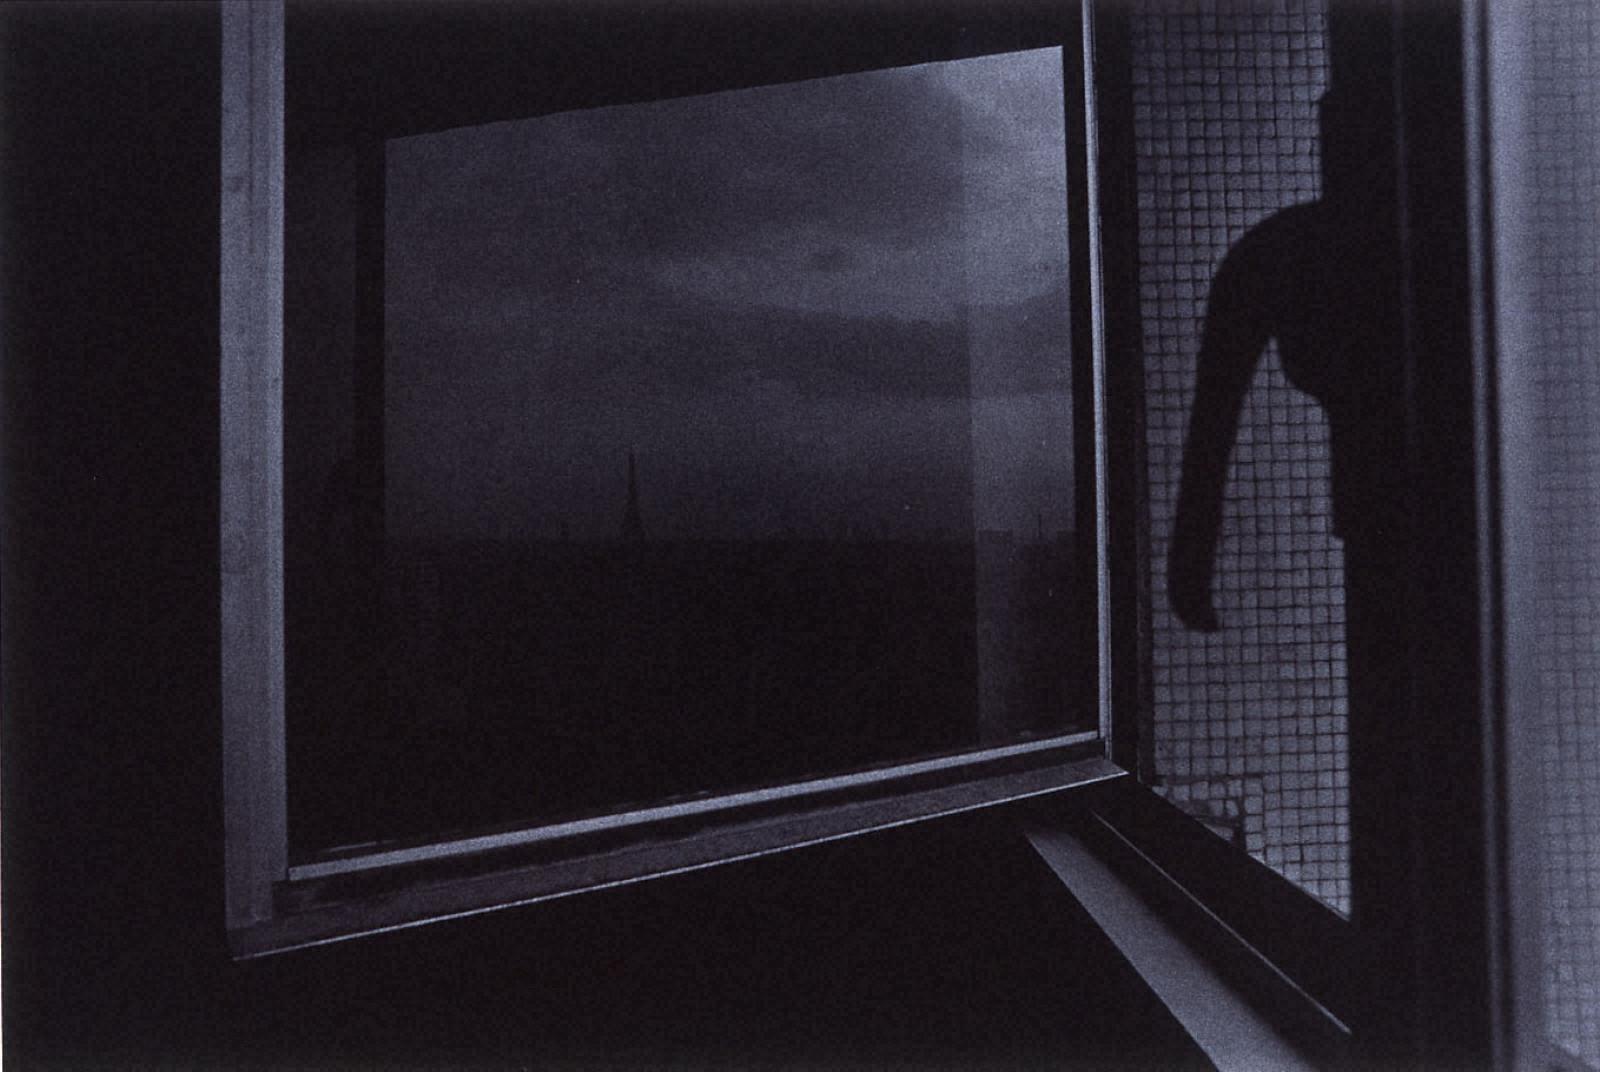 [Jun SHIRAOKA Photographs 1970-1998]フランス、パリ(ジュルジュ・ピタ-ル通り)、1980年8月